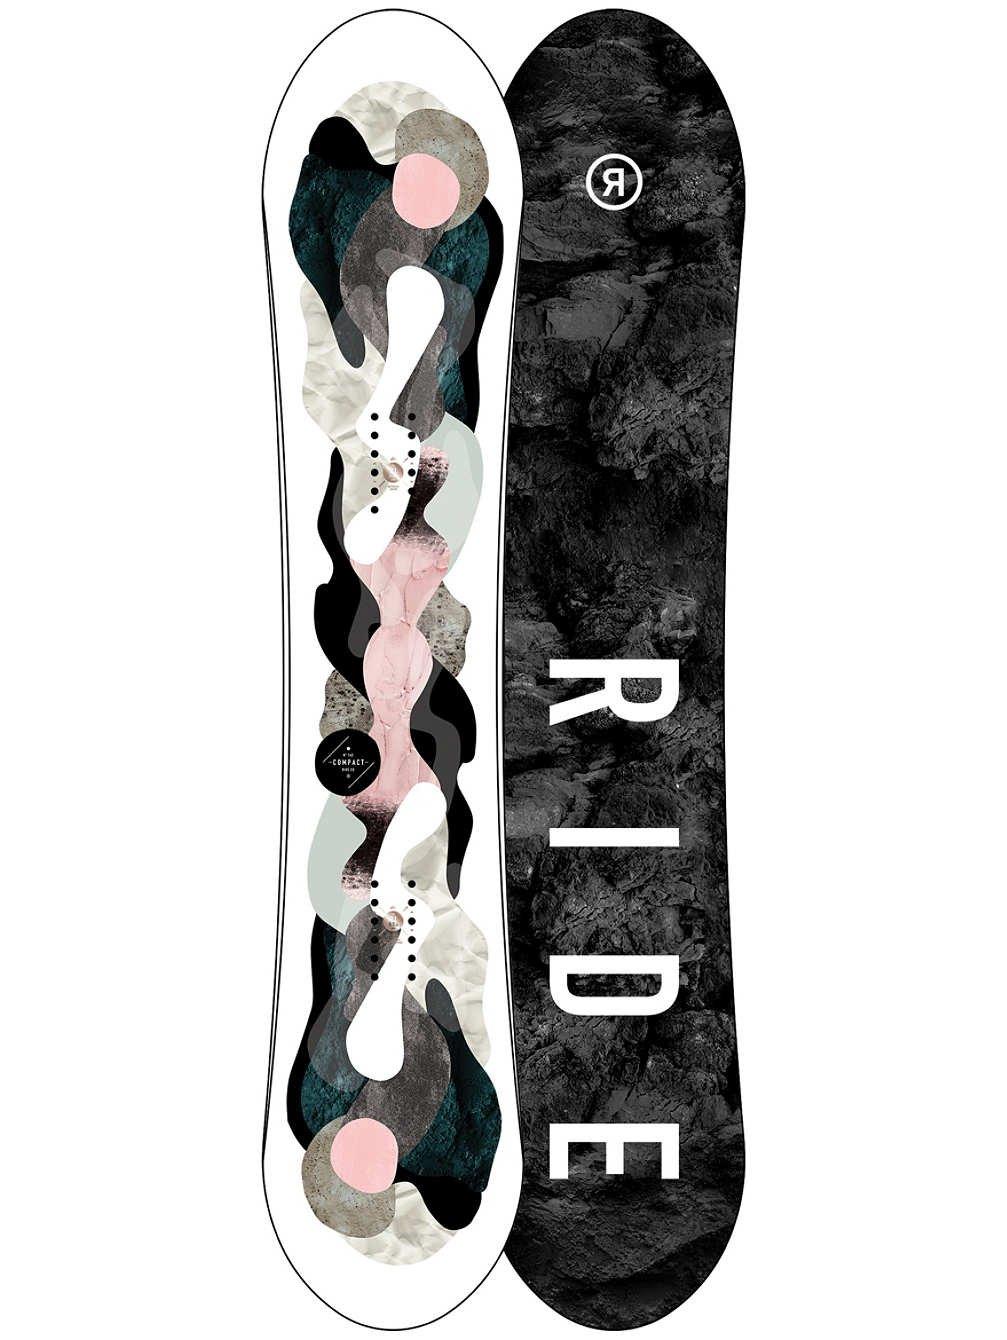 b802978f1 Amazon.com   Ride Blush Snowboard - Youth   Sports   Outdoors